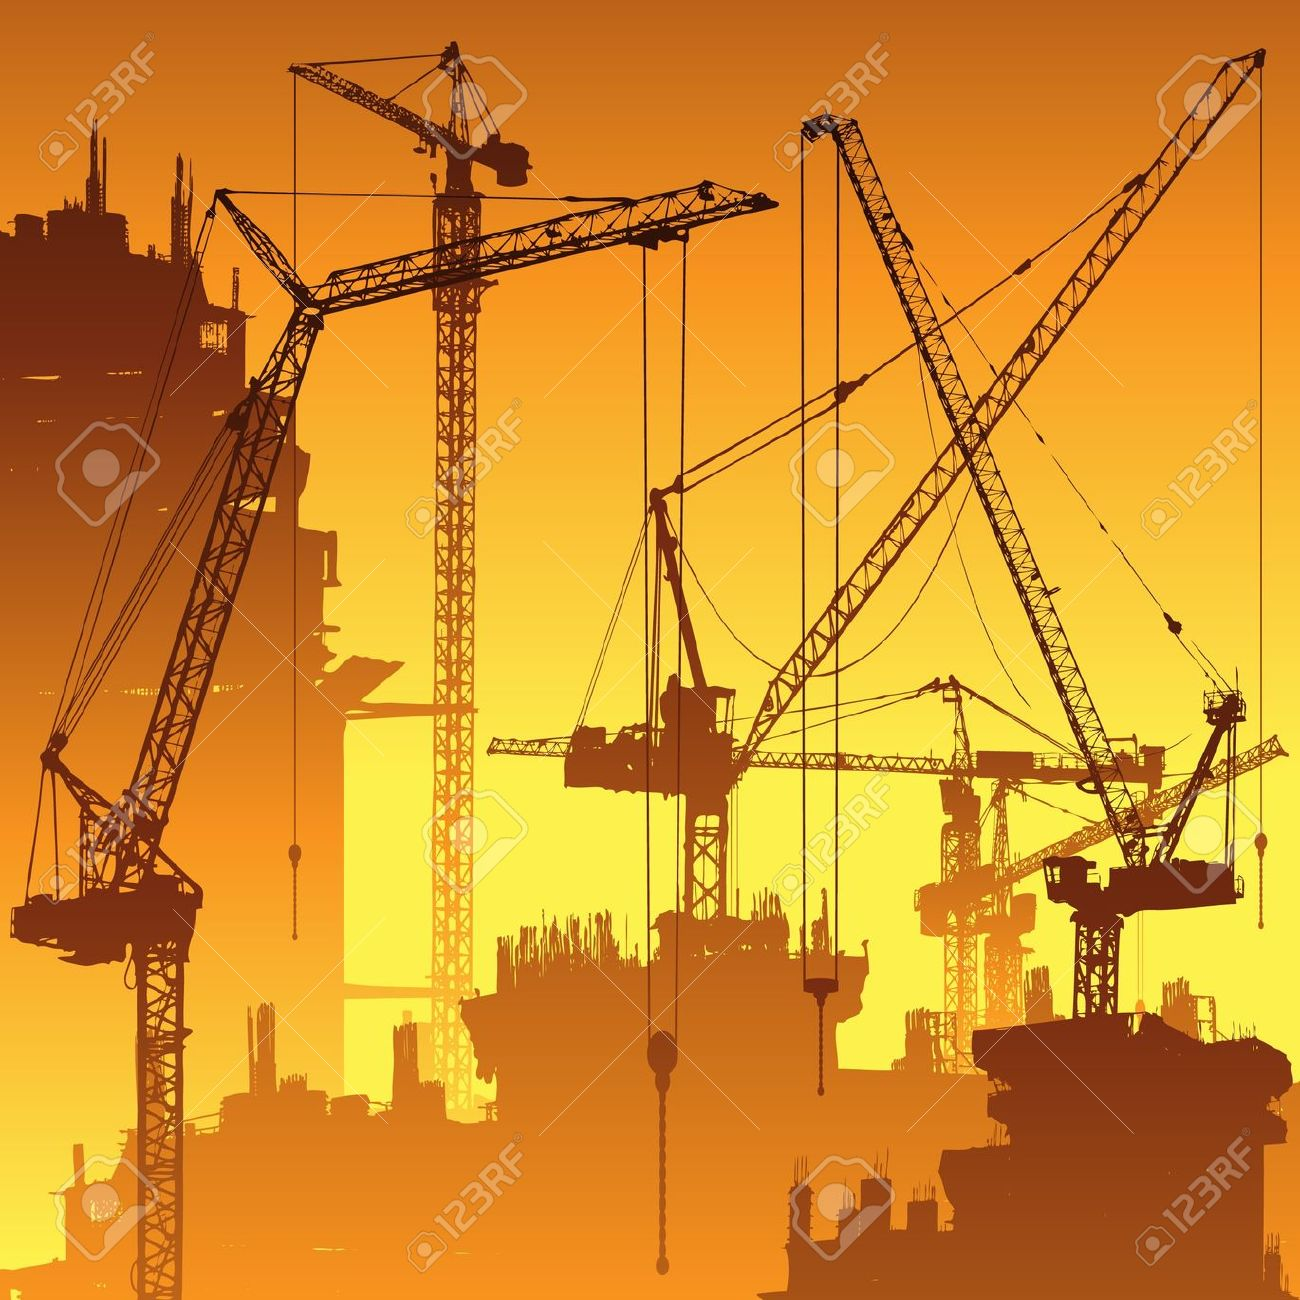 Construction site background clipart transparent download Construction clipart background - ClipartFest transparent download